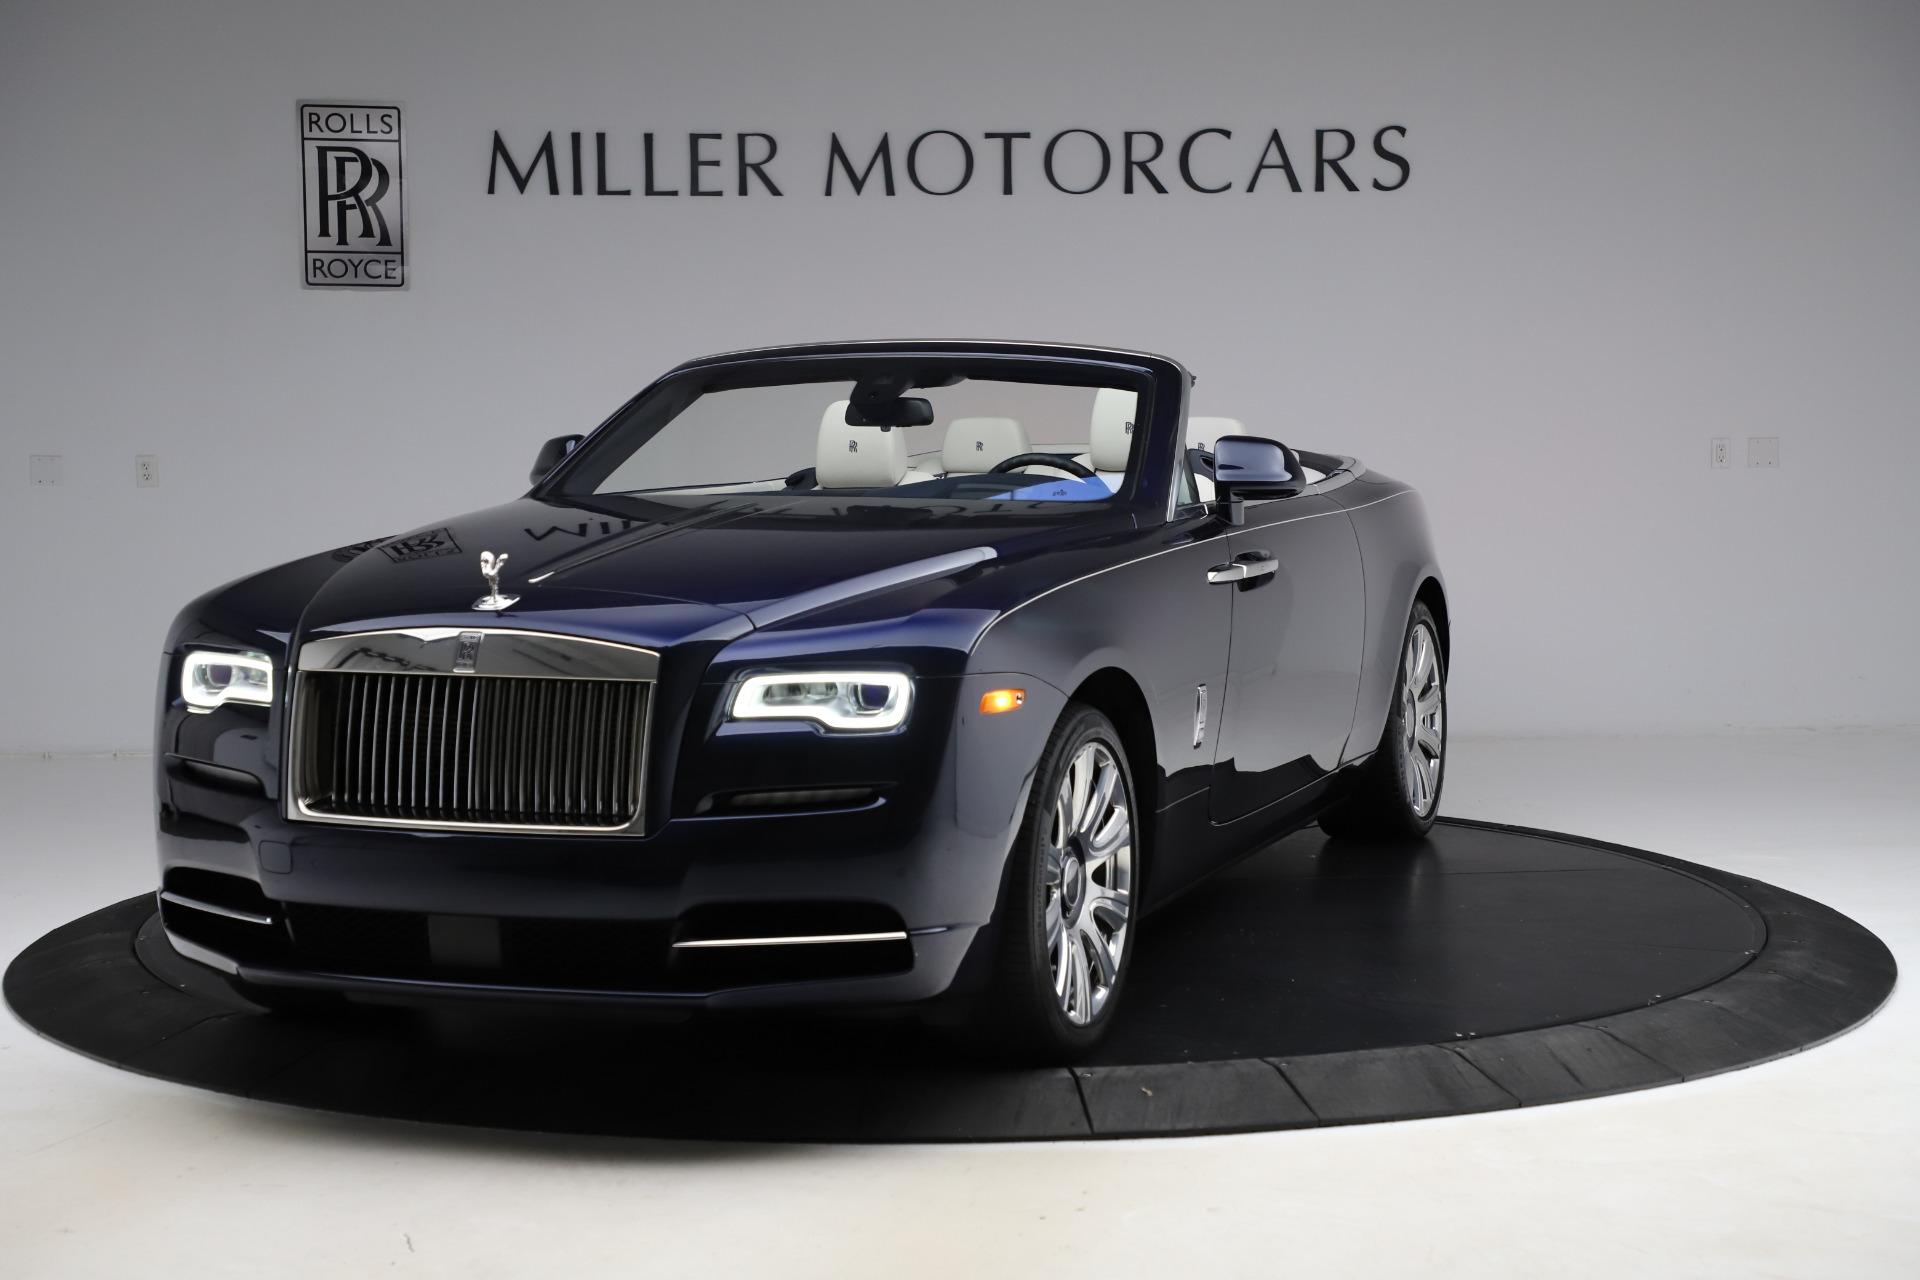 Used 2016 Rolls-Royce Dawn for sale $243,900 at Bugatti of Greenwich in Greenwich CT 06830 1